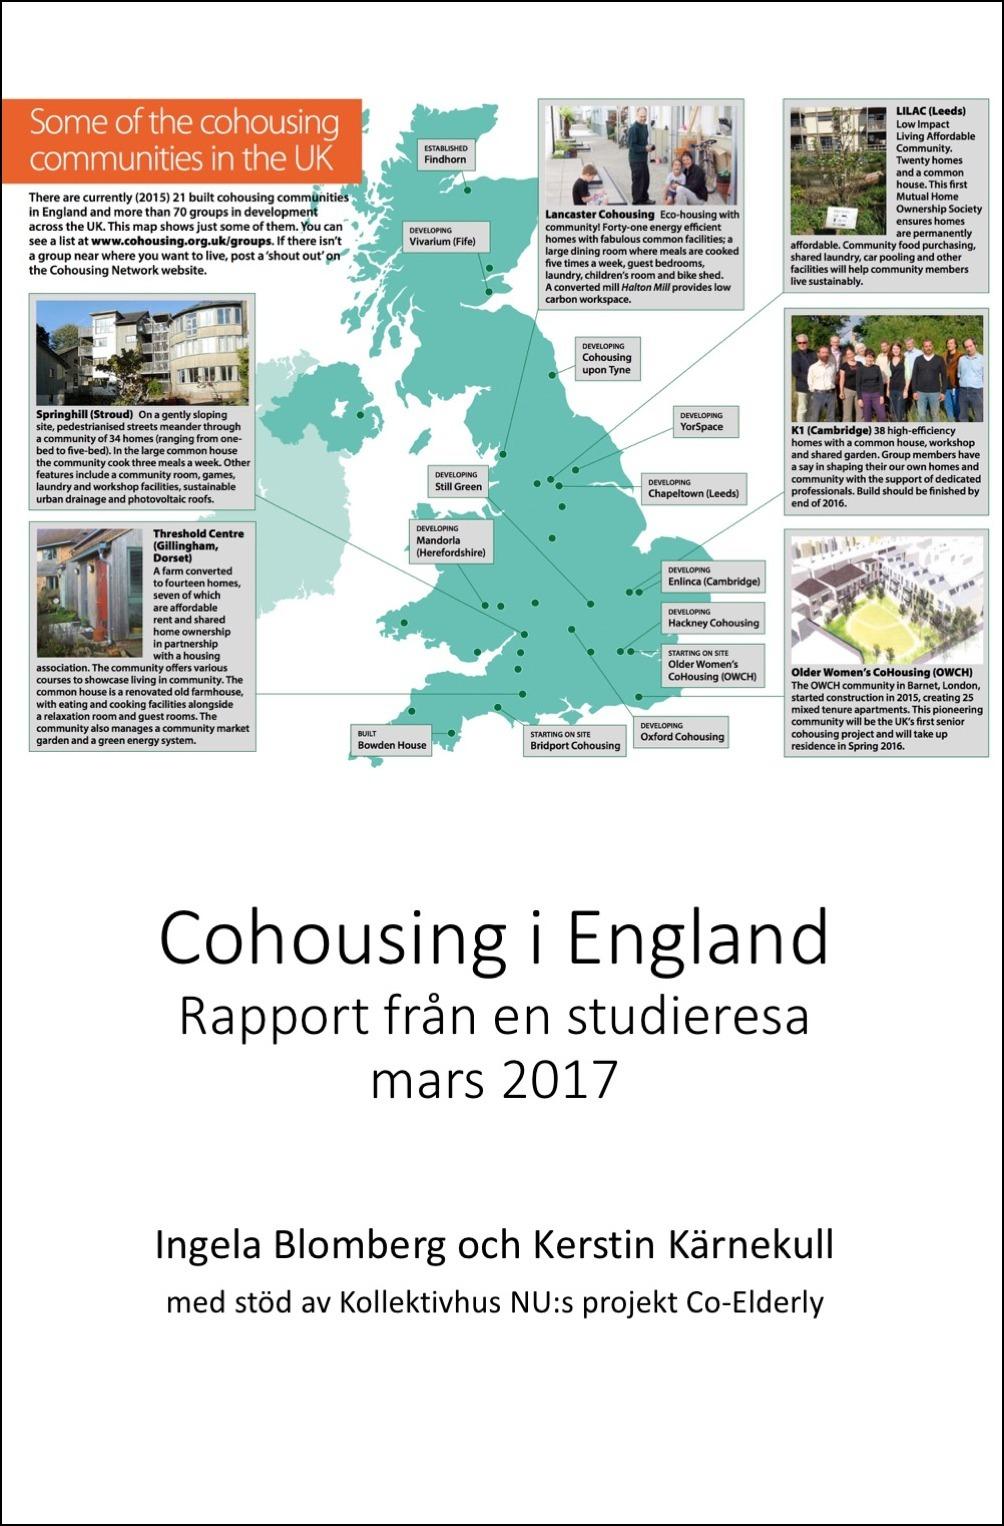 Ny rapport om cohousing i England